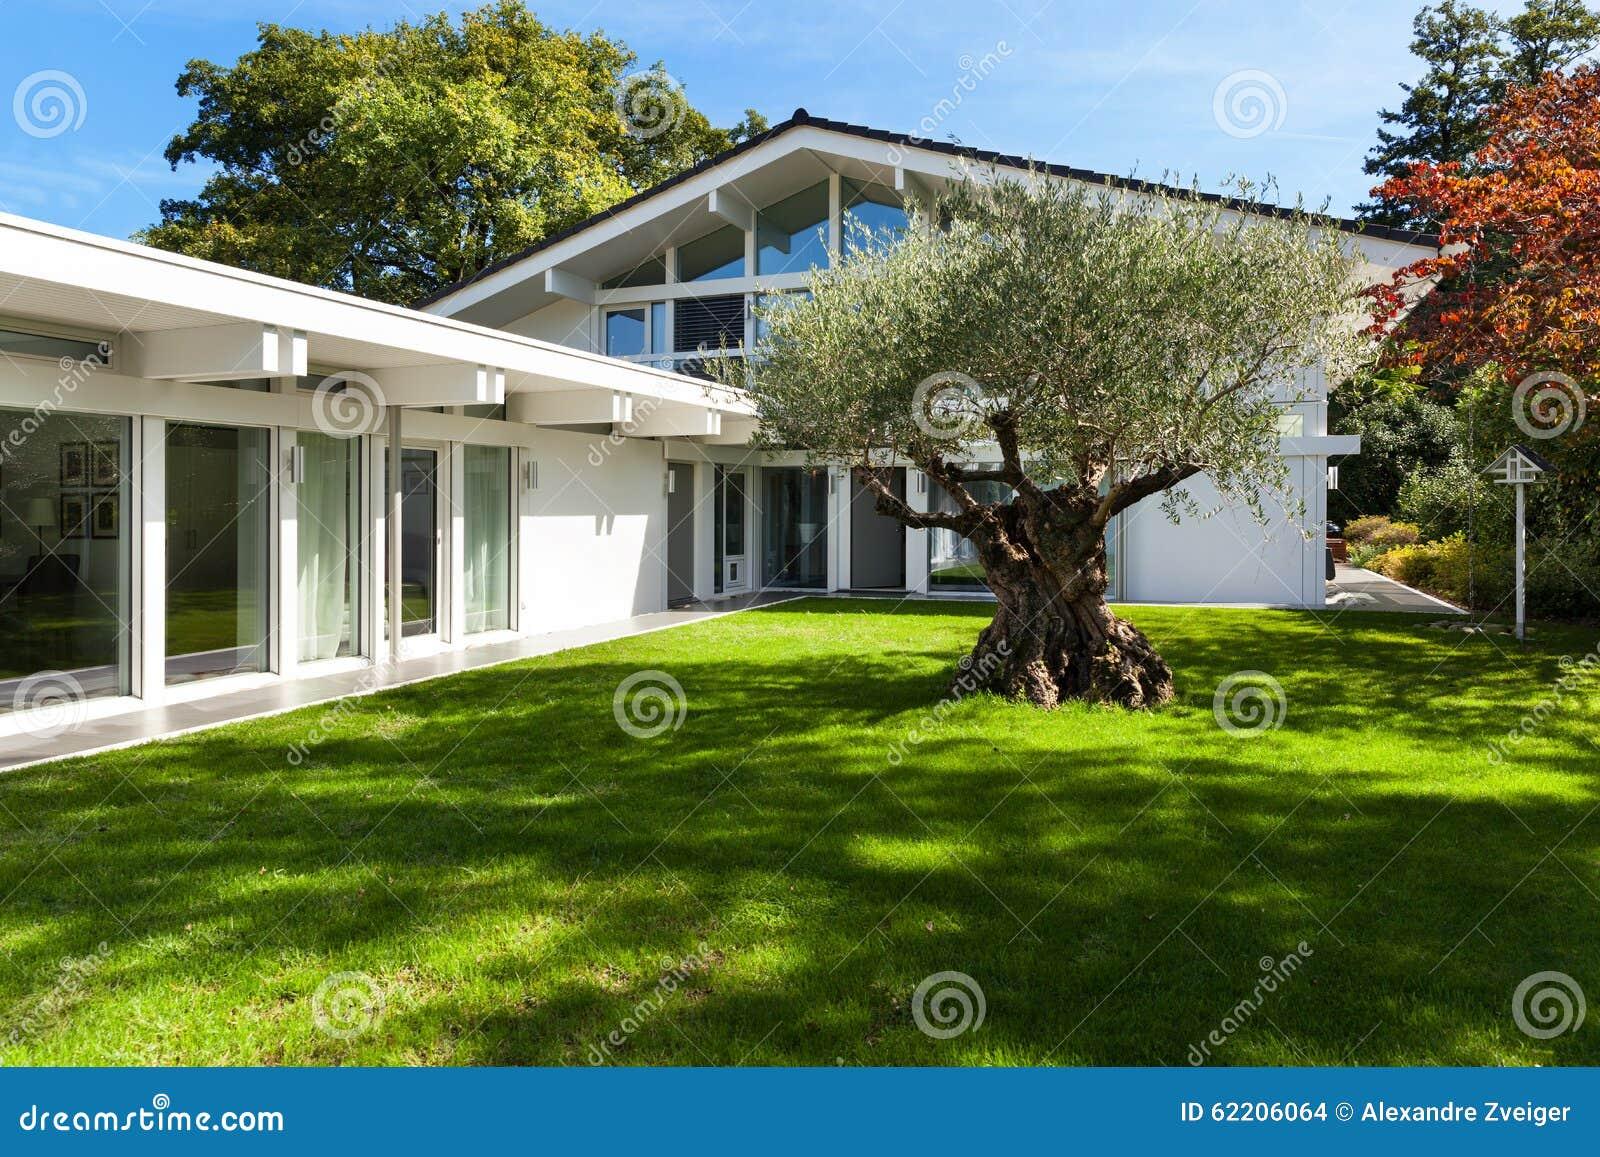 jardin d 39 une maison moderne avec l 39 olivier photo stock image du olive porche 62206064. Black Bedroom Furniture Sets. Home Design Ideas